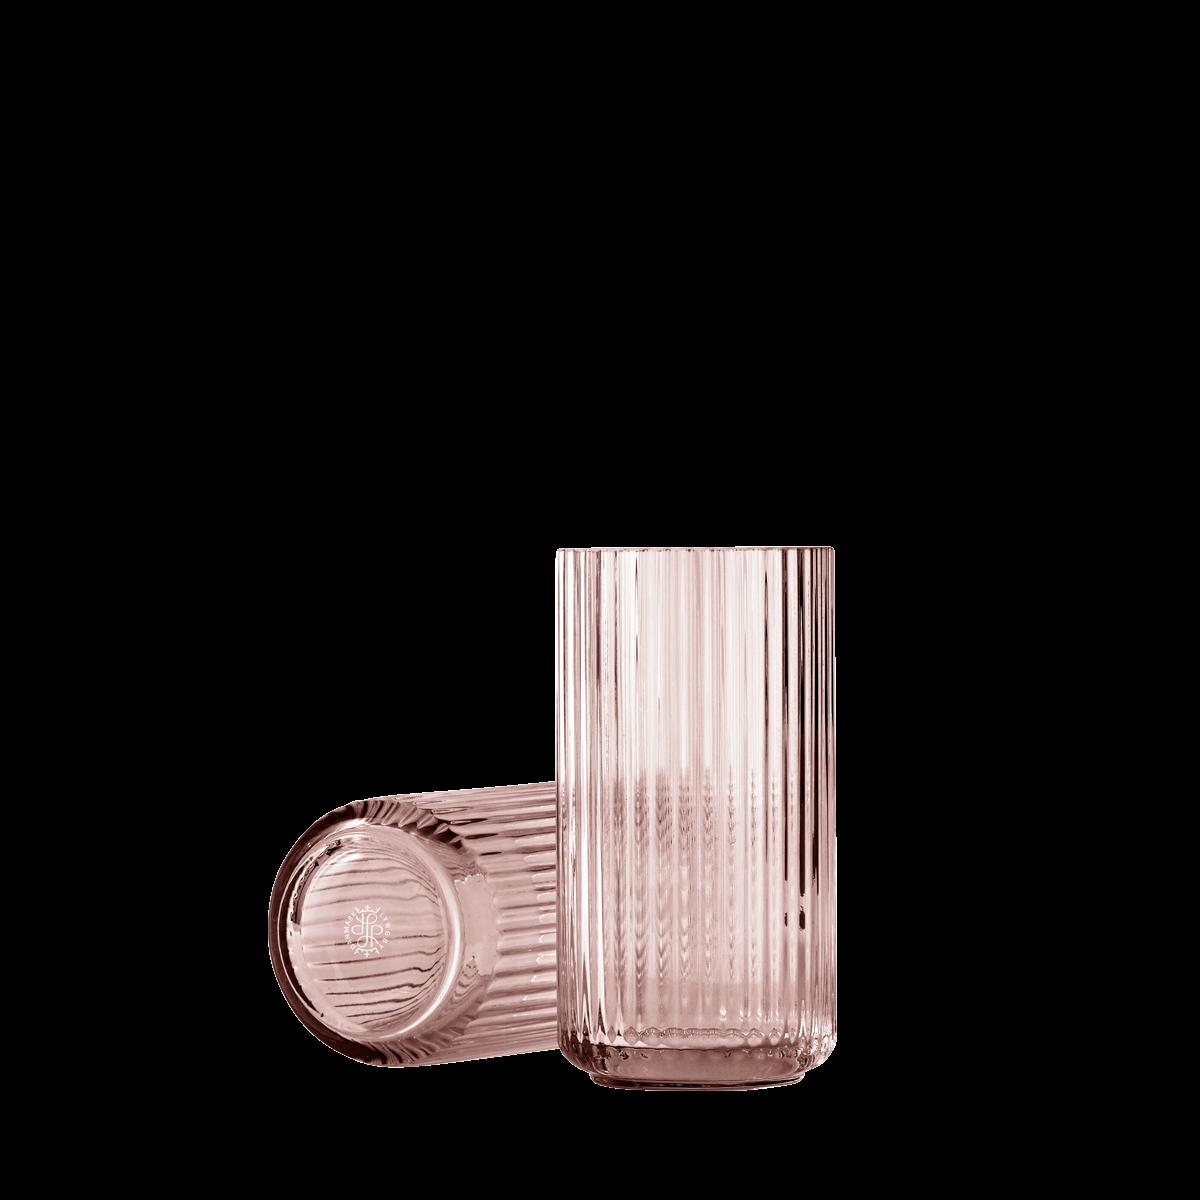 Lyngby Porcelaen Lyngbyvase H20 cm - Burgundy - Mouth blown glass